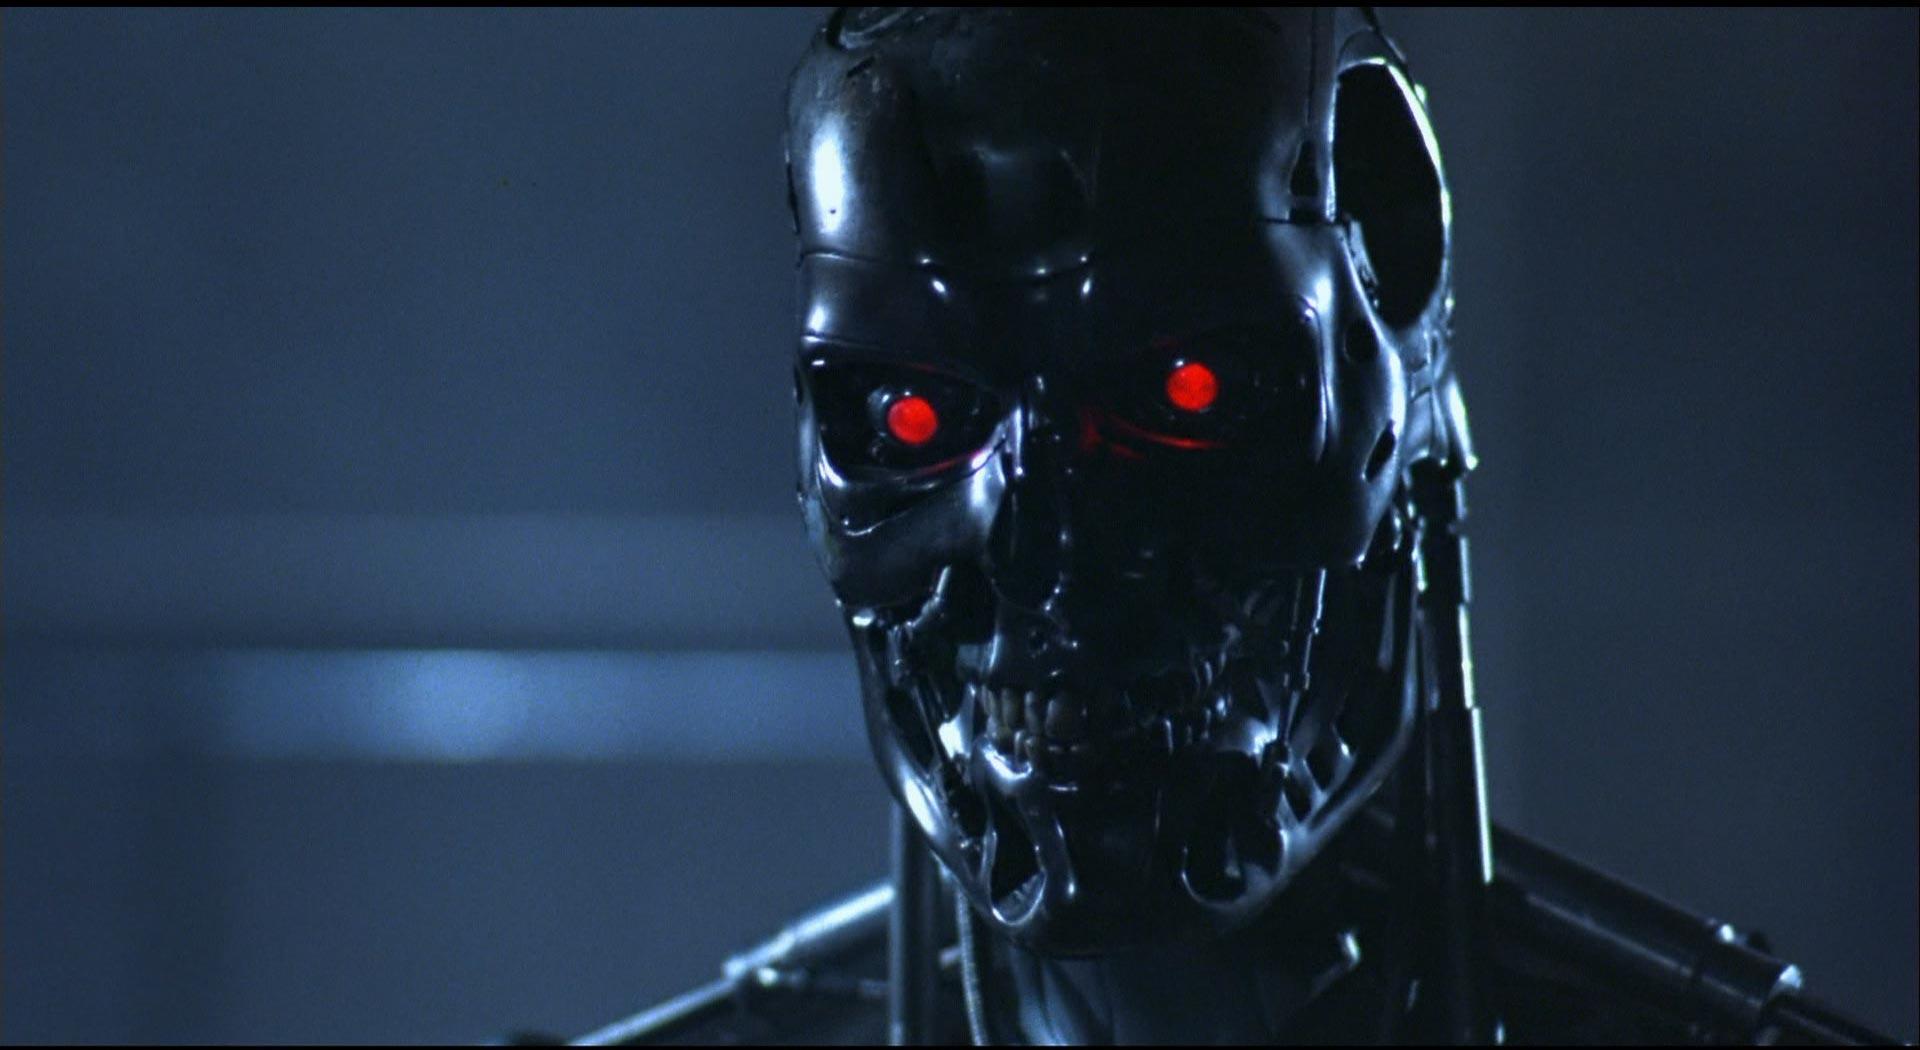 Movies-For-Gamers-The-Terminator-endo-skeleton.jpg